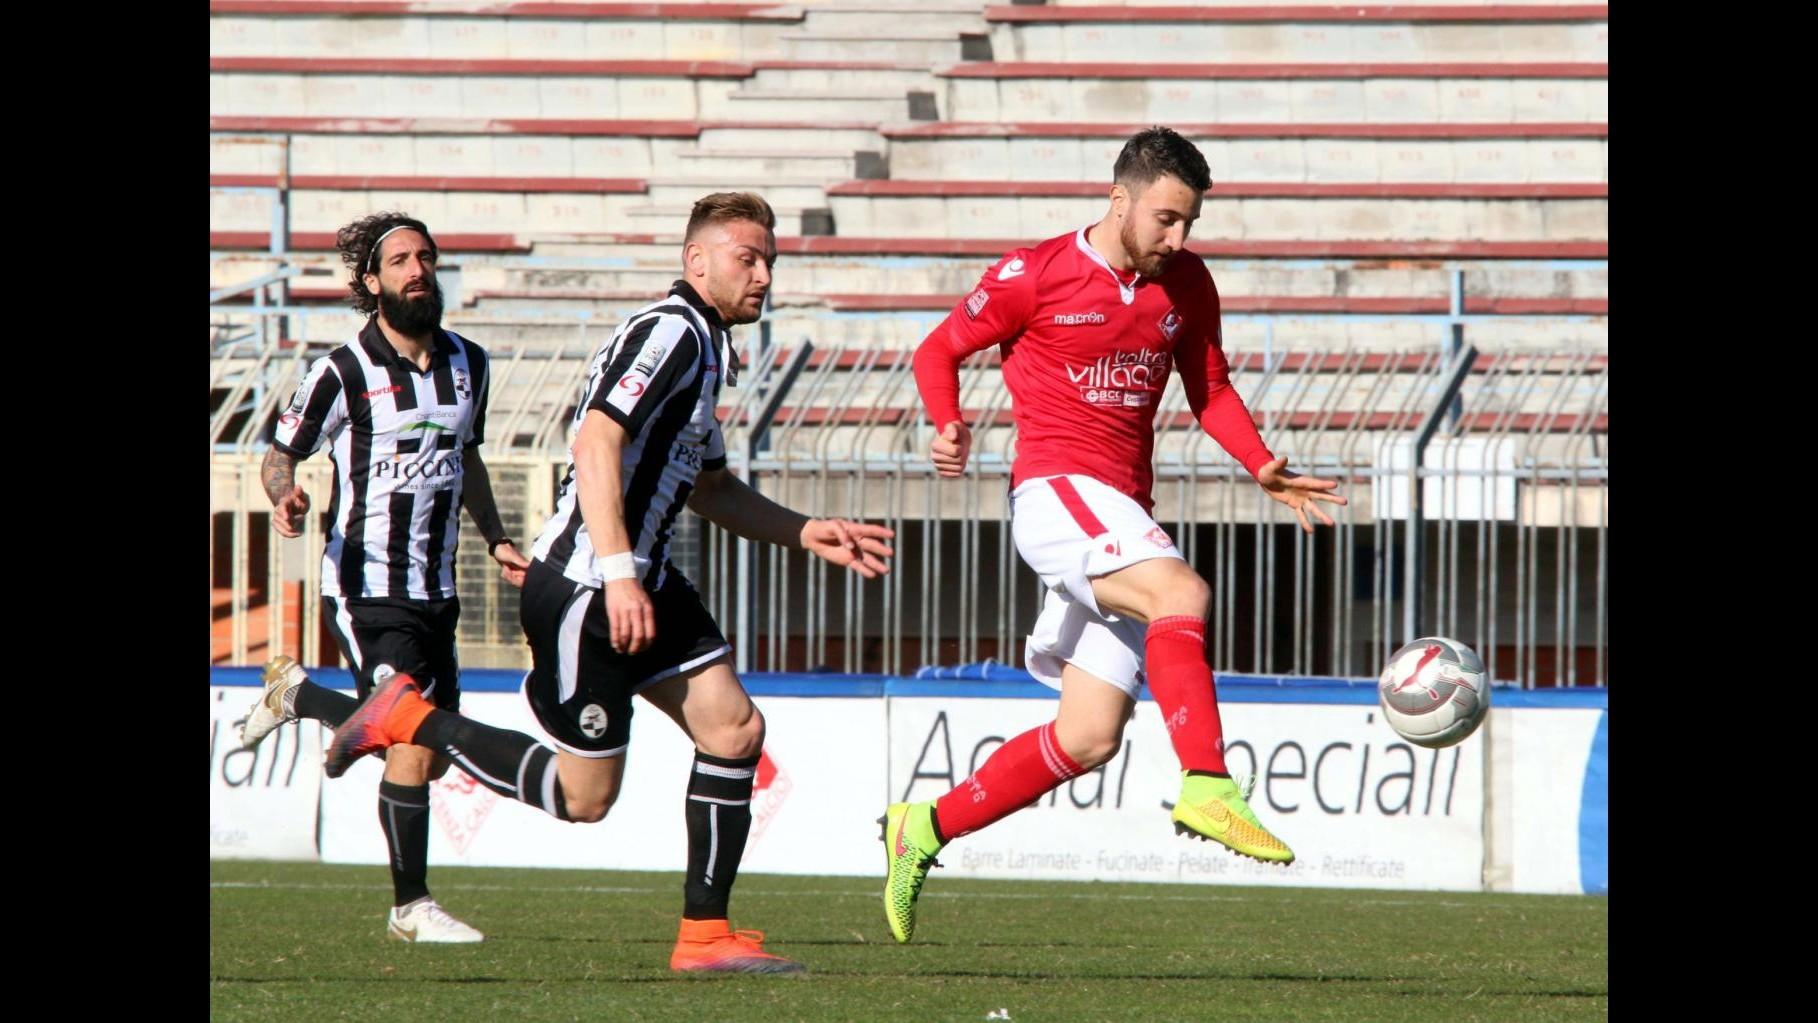 FOTO Lega Pro, Piacenza travolge Siena 3-0